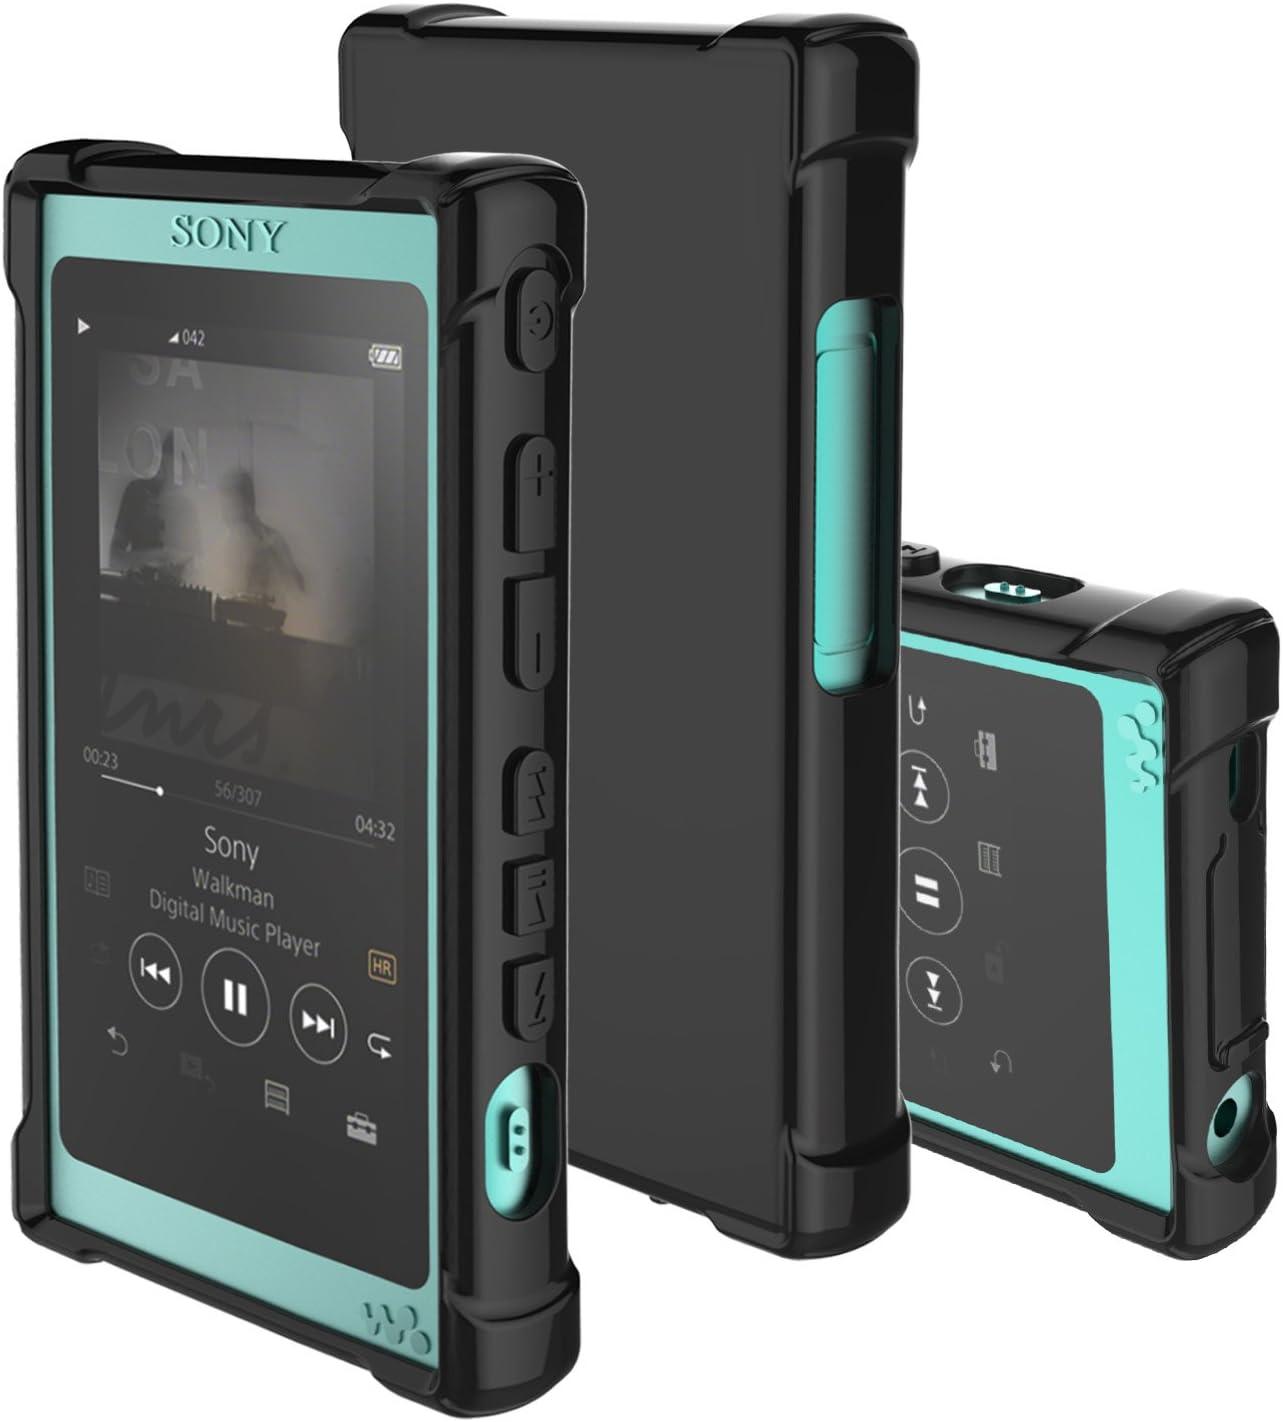 Inorlo Tpu Tasche Hülle Case Cover Für Sony Walkman Elektronik